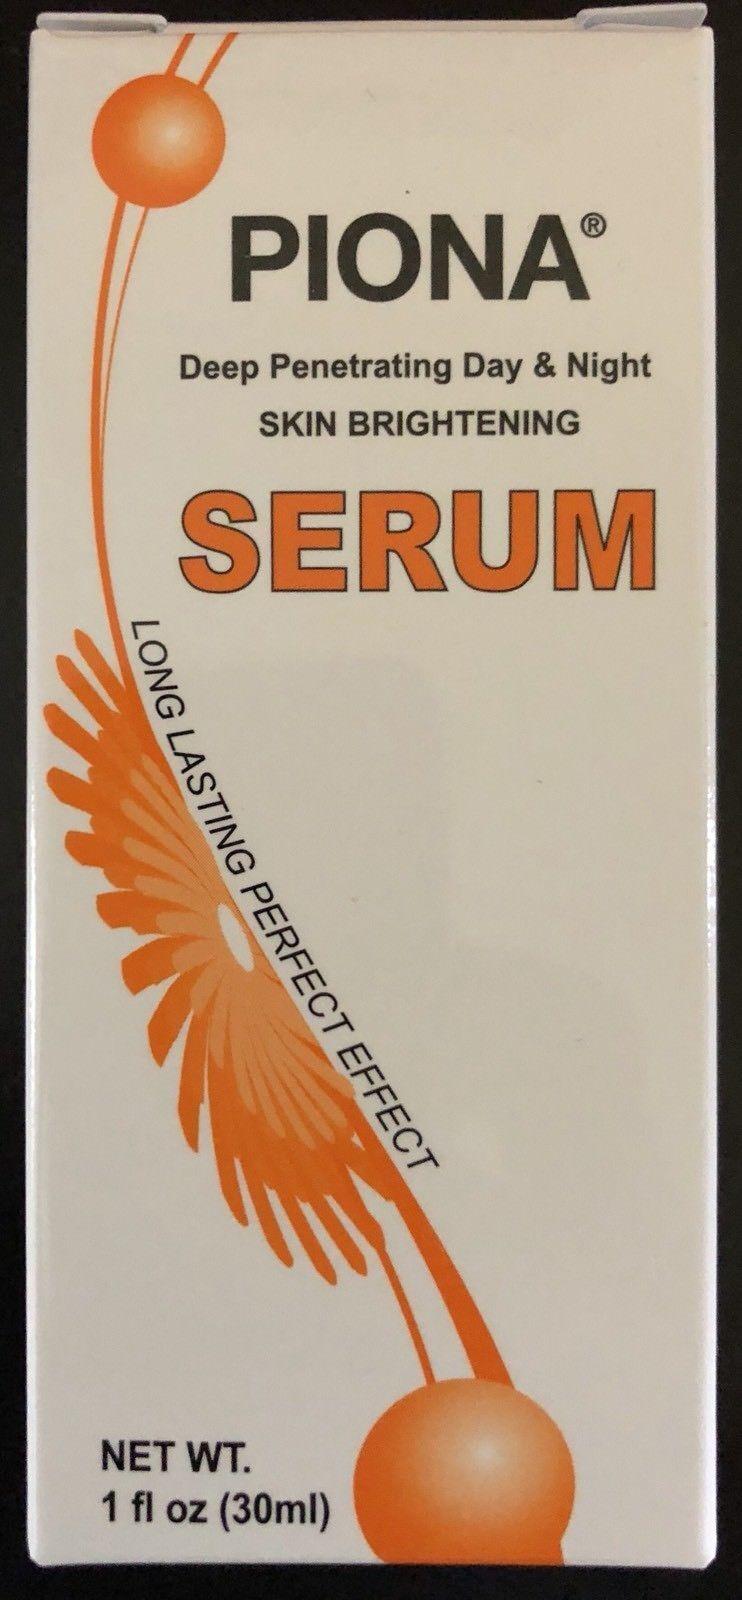 Piona Deep Penetrating Day & Night Skin Brightening Serum 1oz Health & Beauty